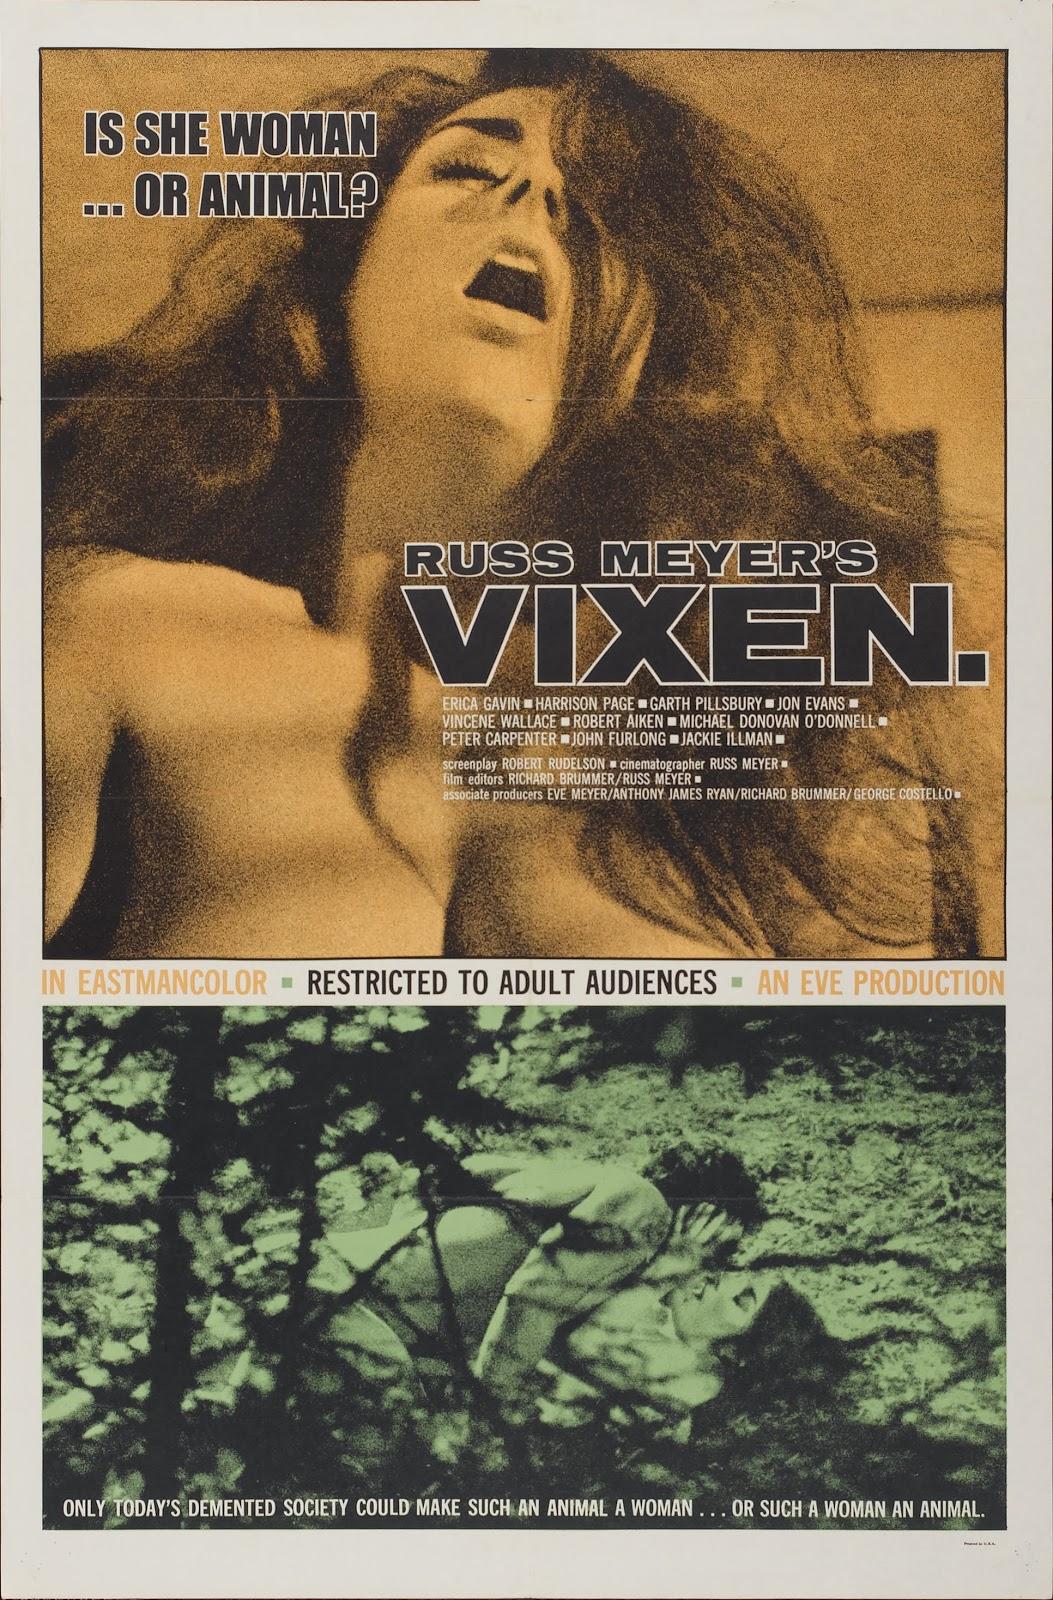 film genere erotico video ponografico